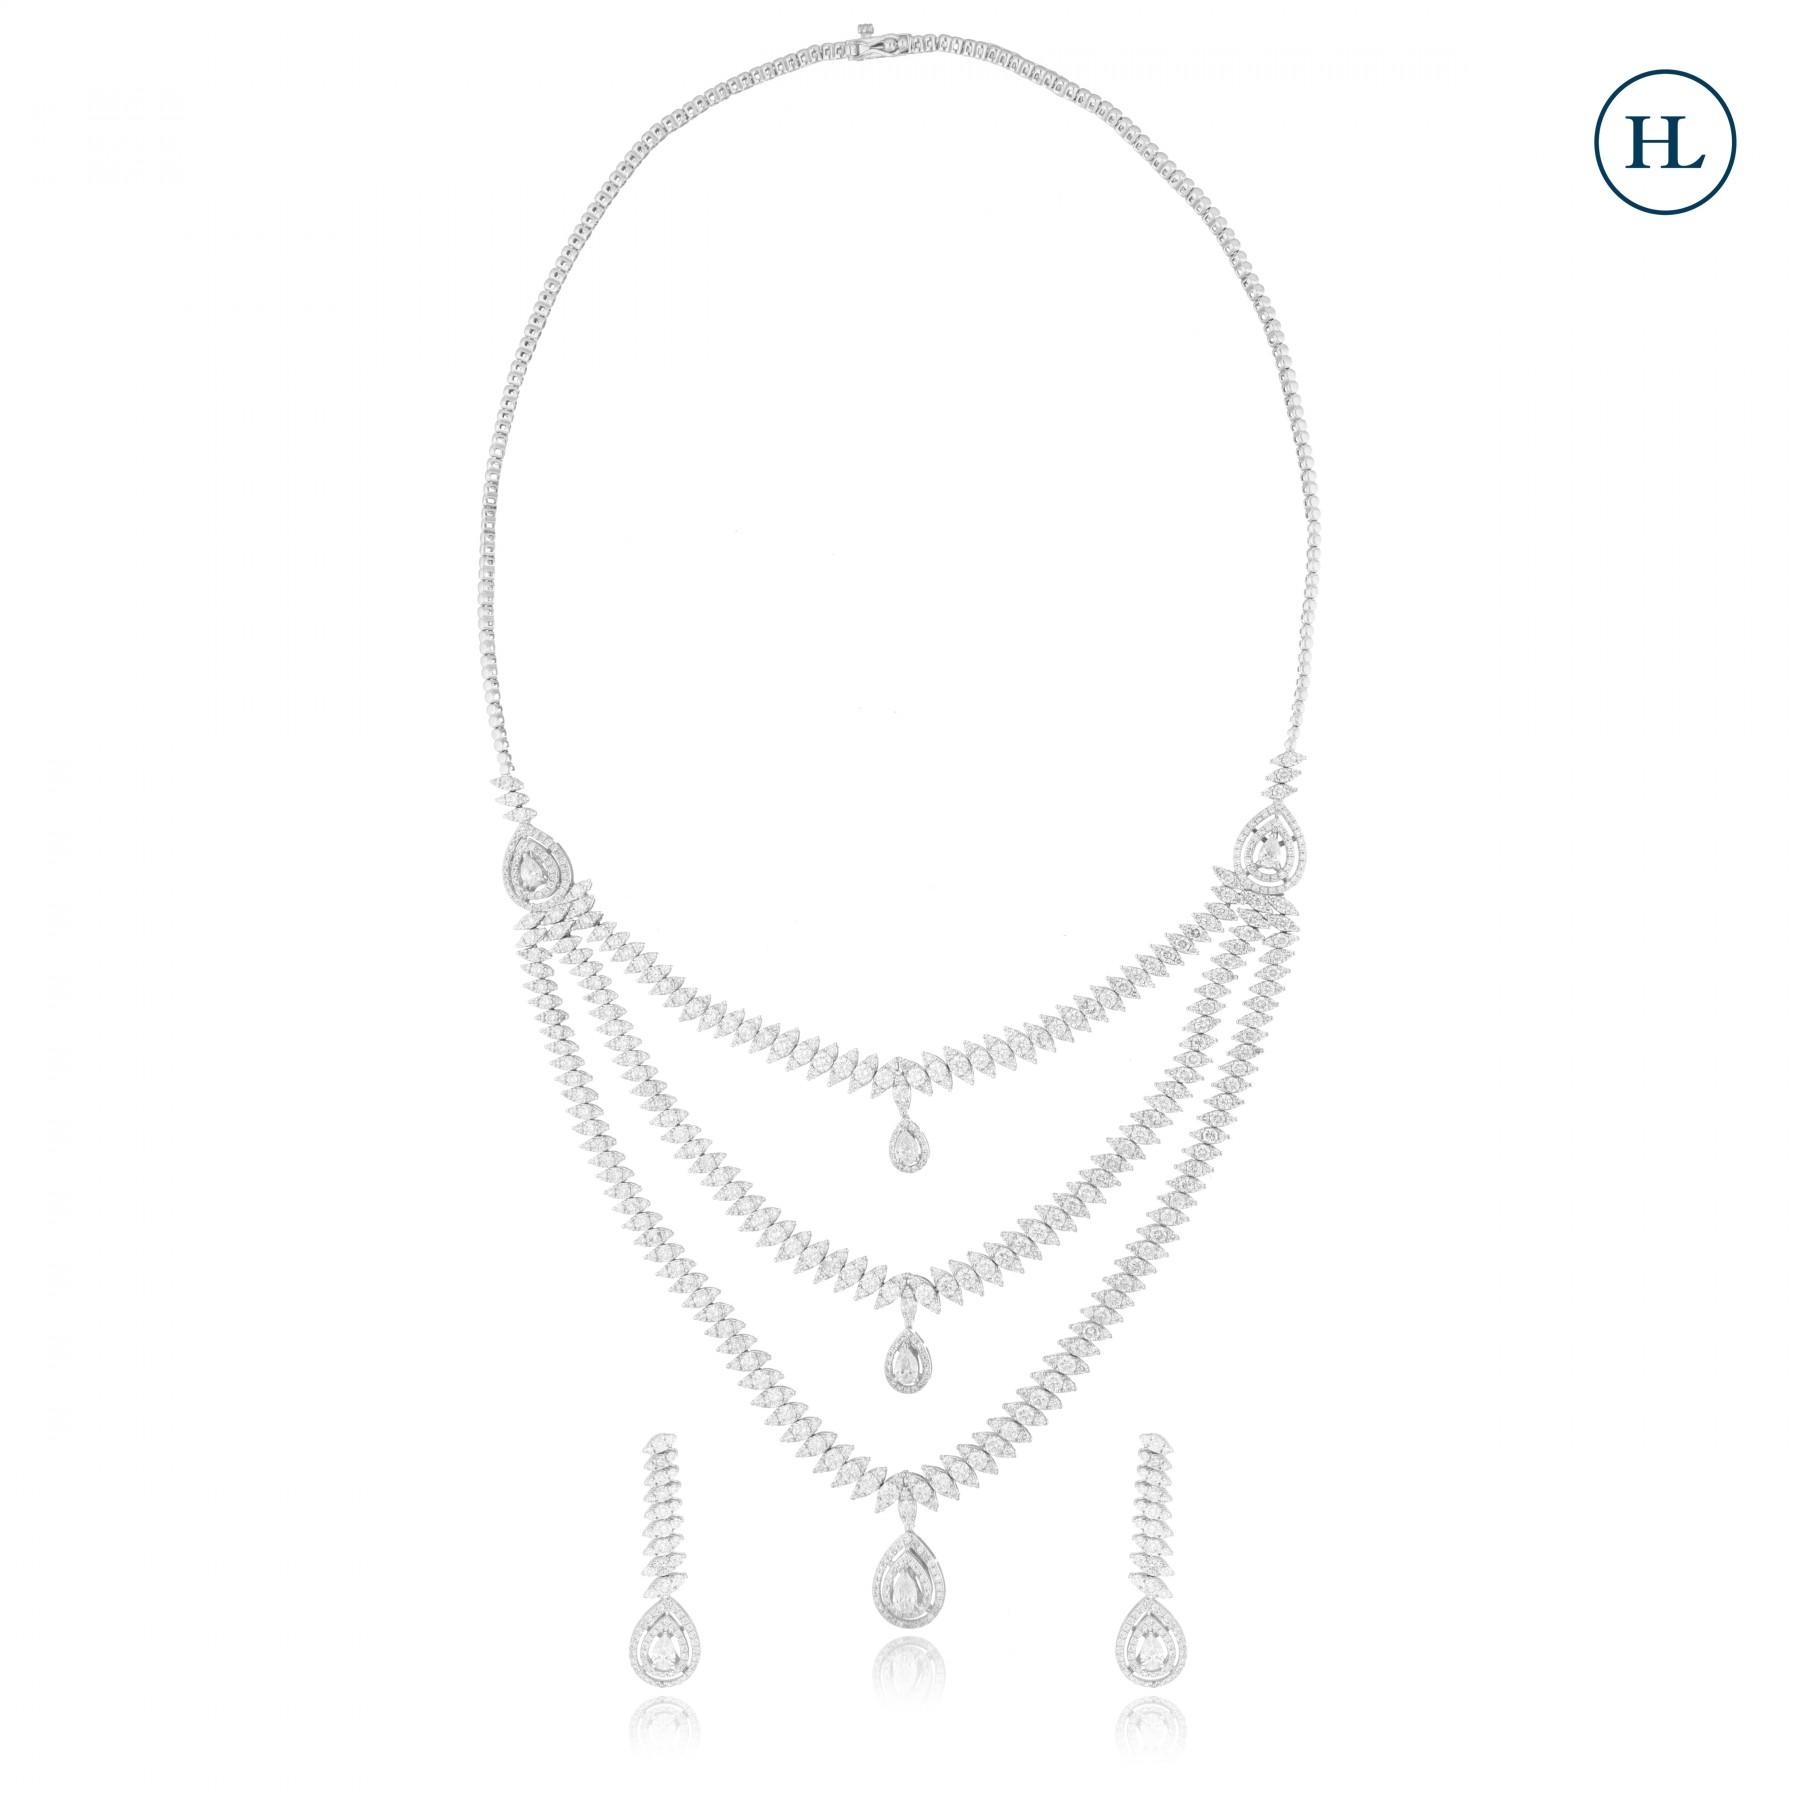 Three Lines Diamond Necklace Set